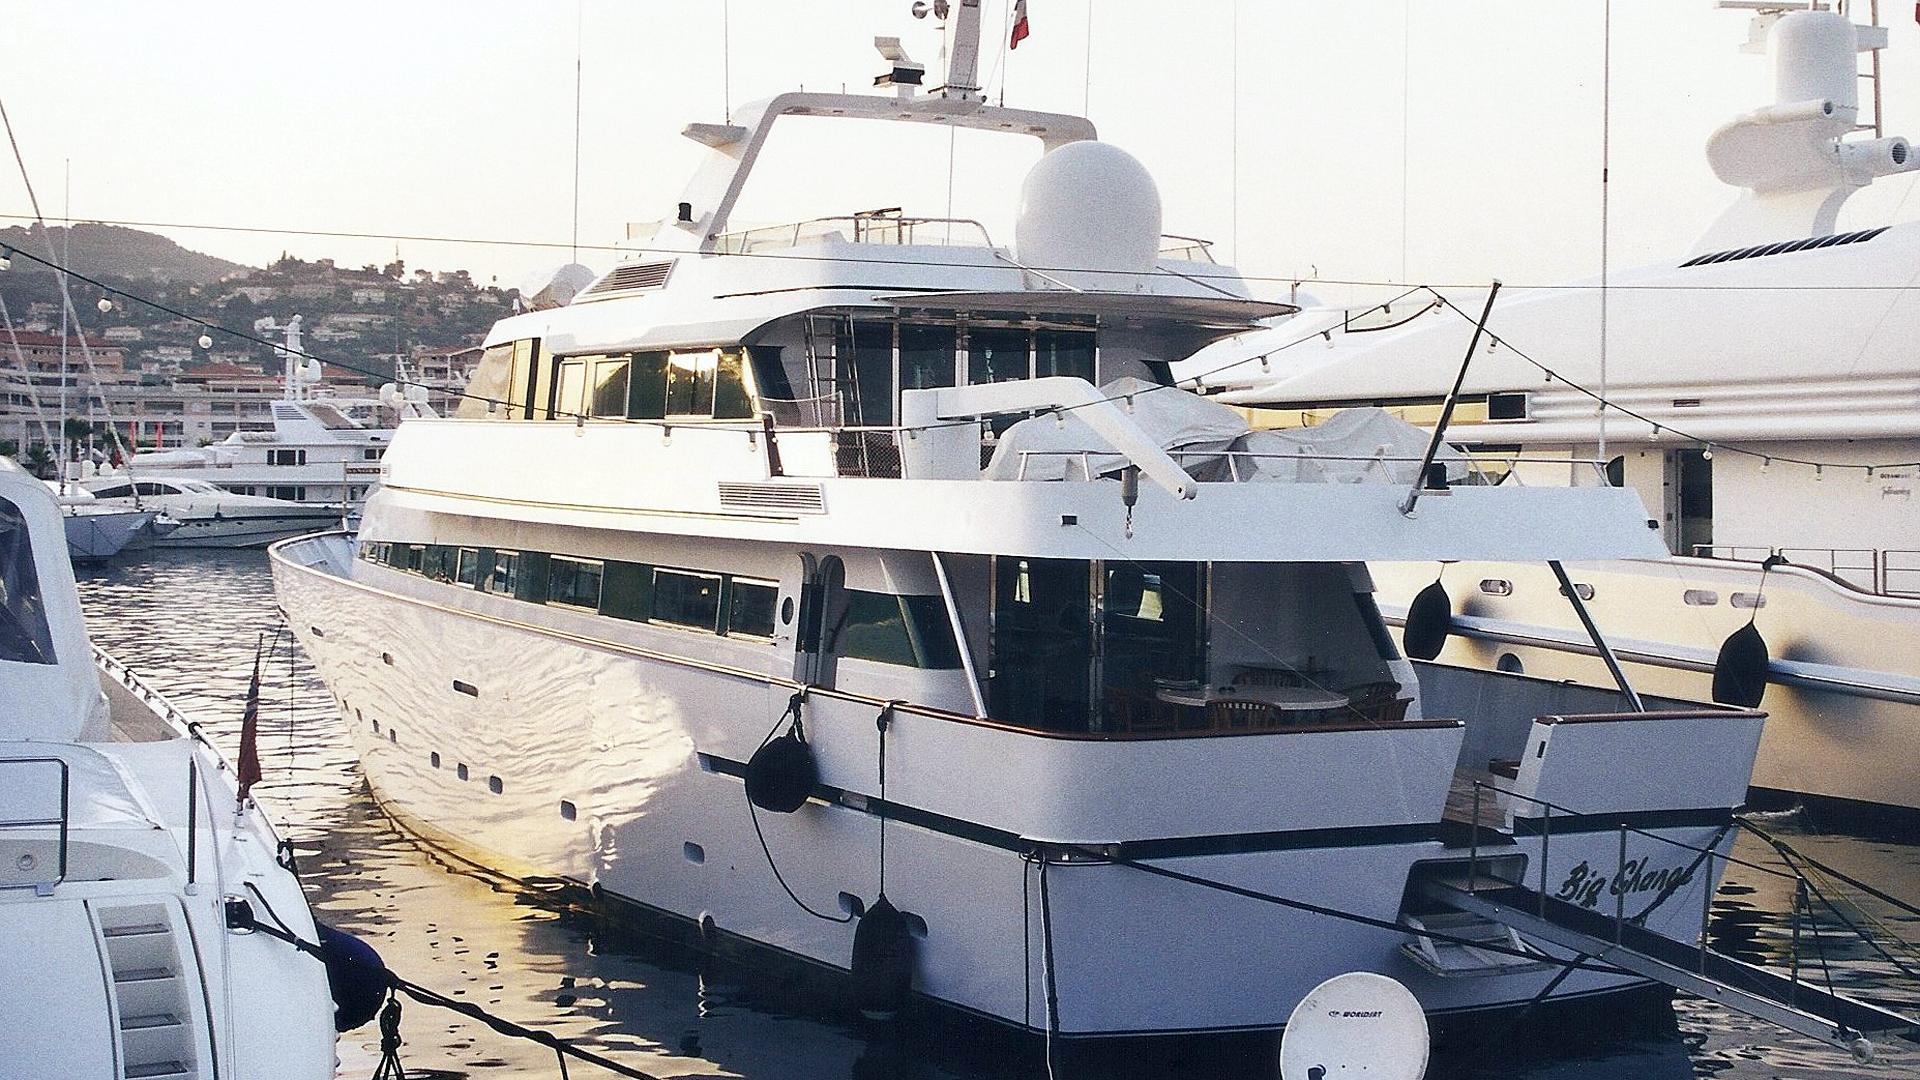 big-change-ii-motor-yacht-proteksan-1986-38m-stern-before-refit